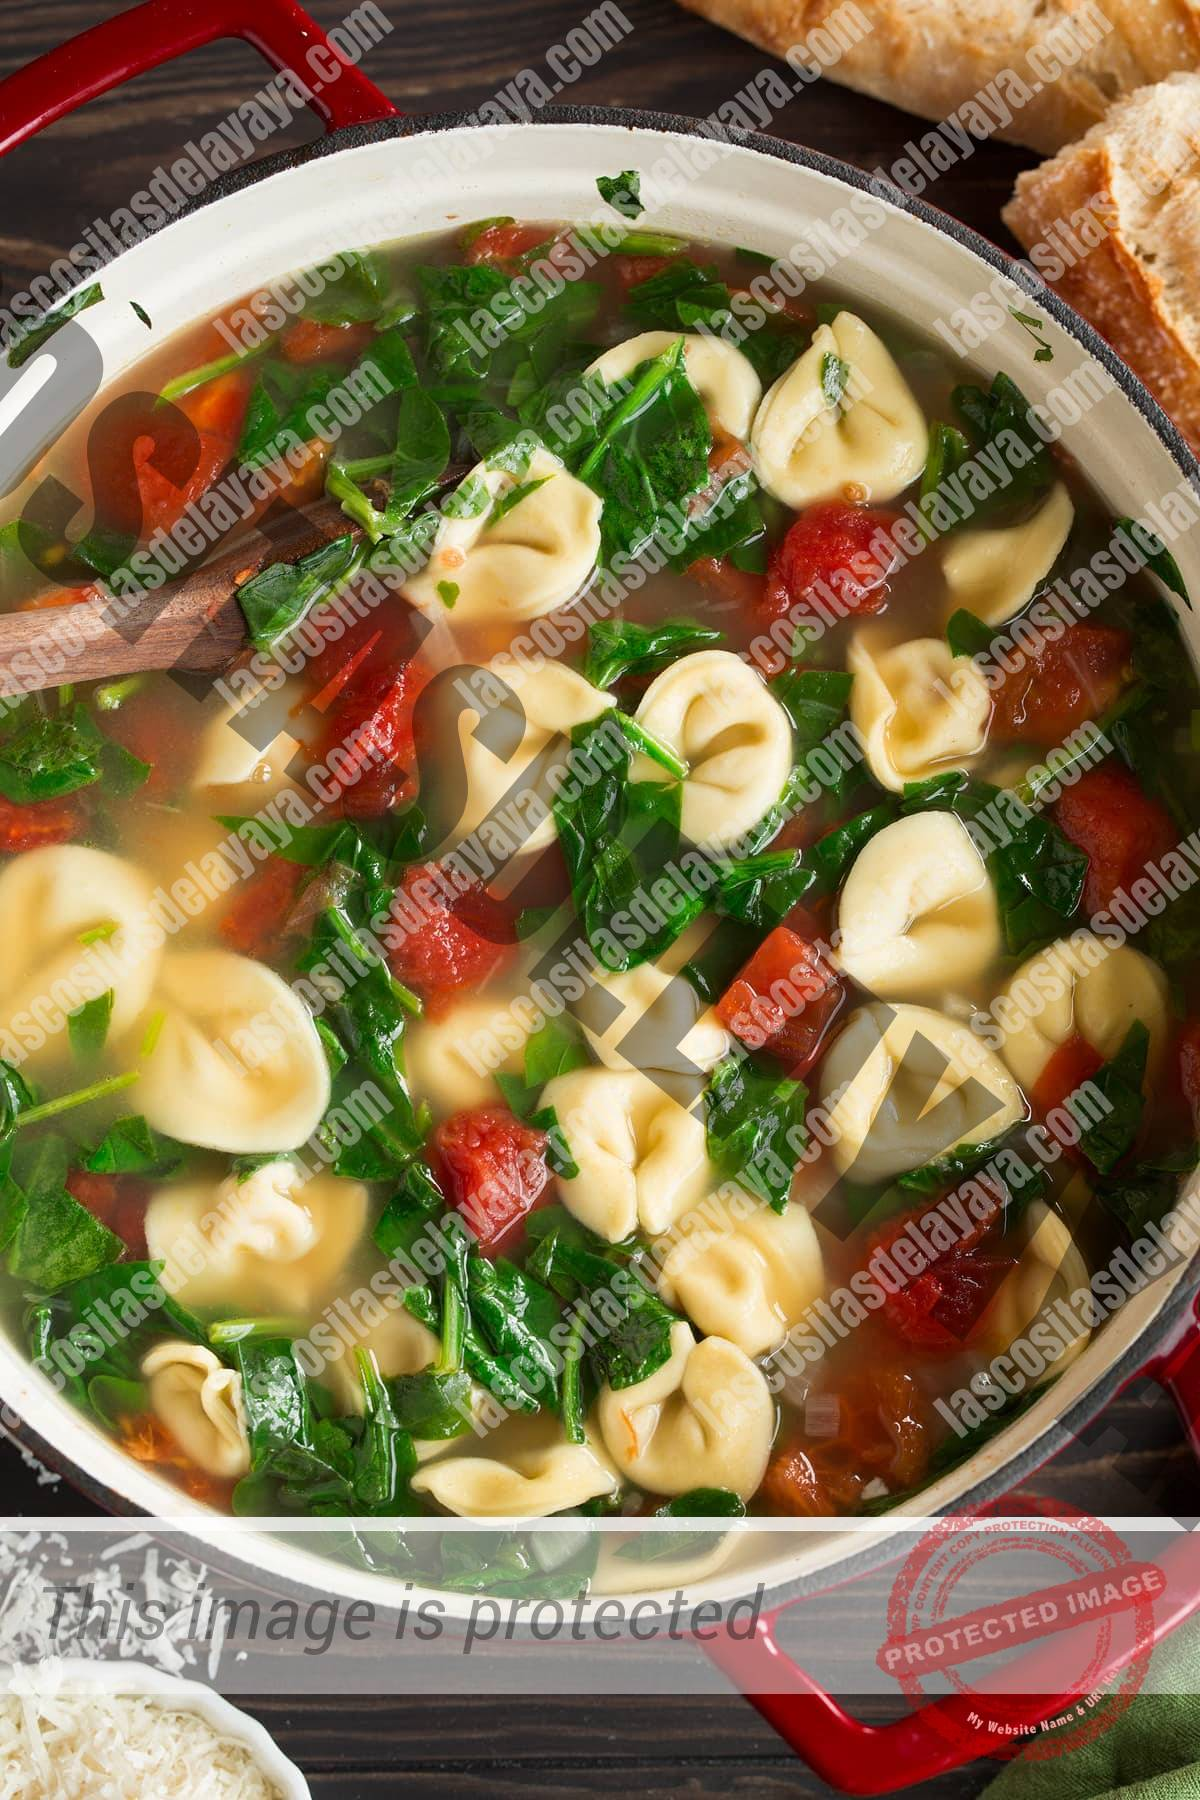 Imagen aérea de sopa de tortellini en una sartén roja grande.